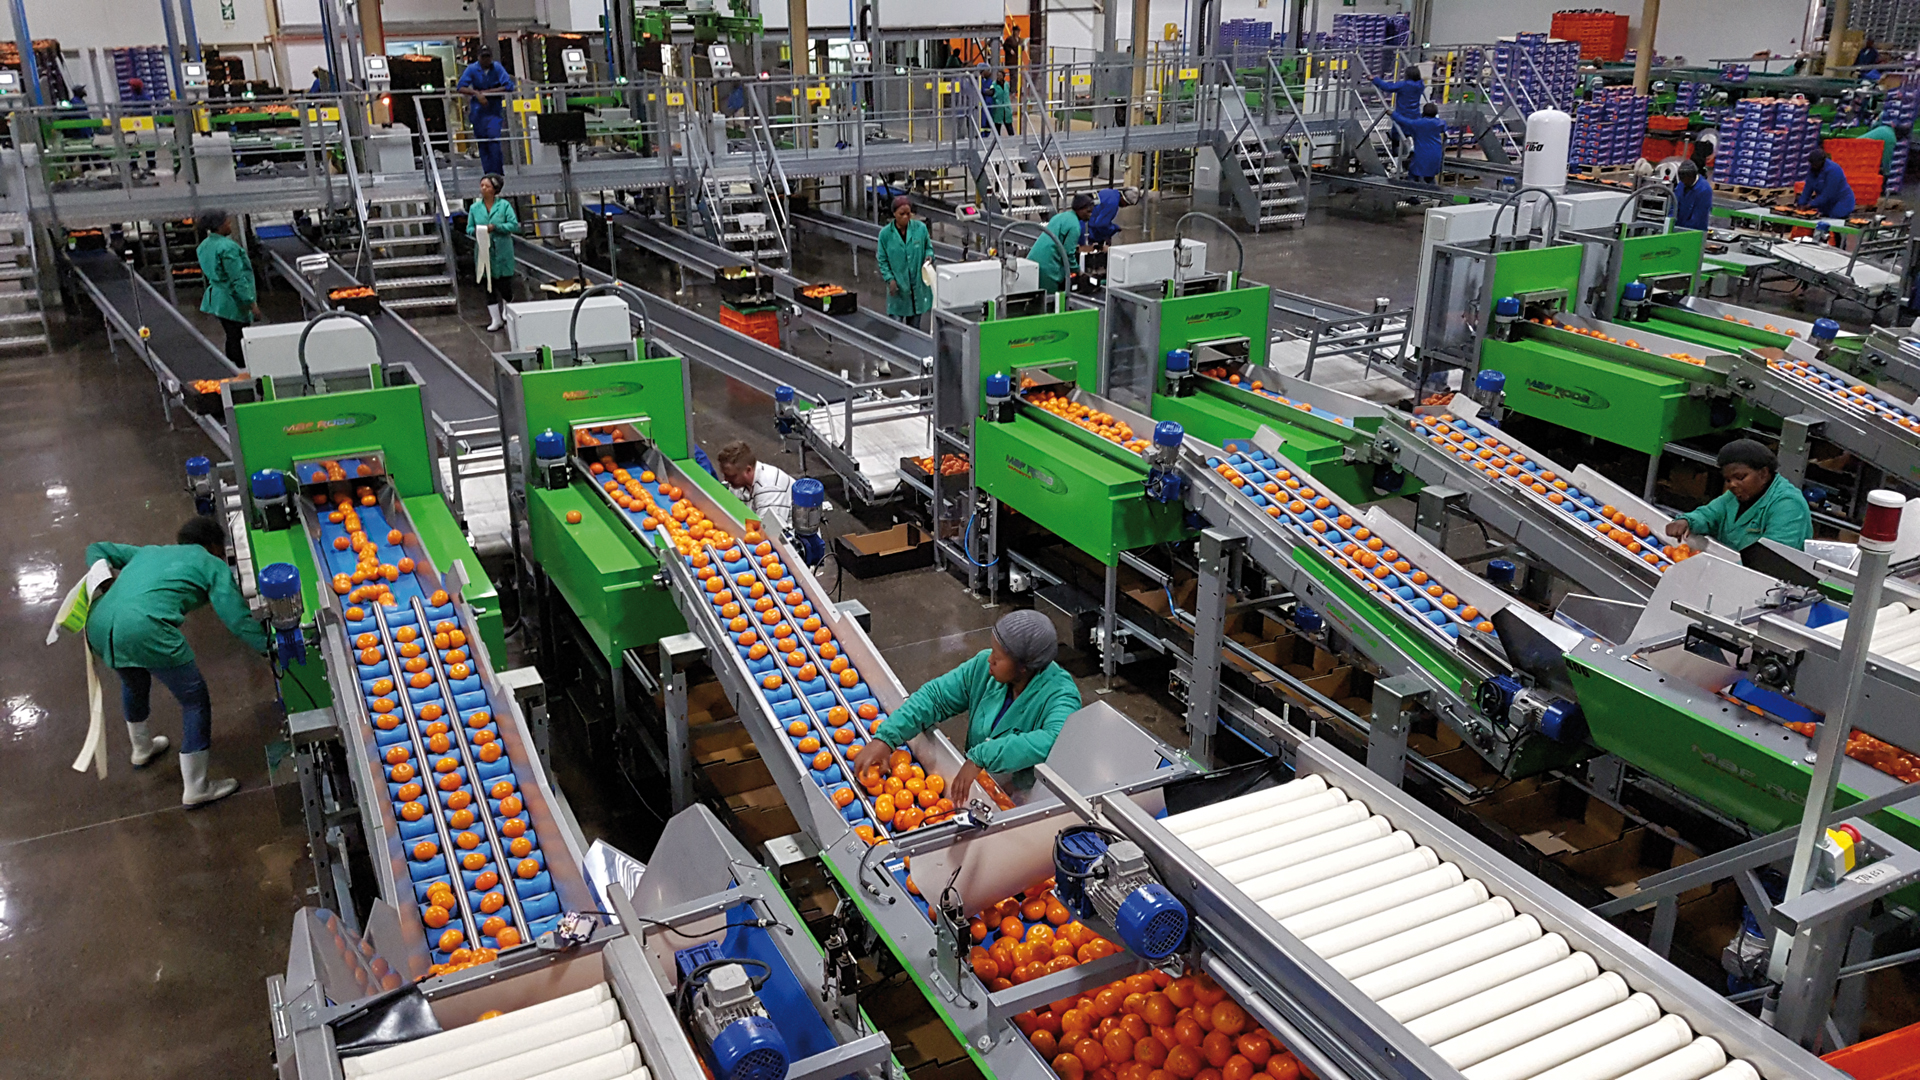 INDIGO FRUIT FARMING - station fruitière - agrumes / oranges